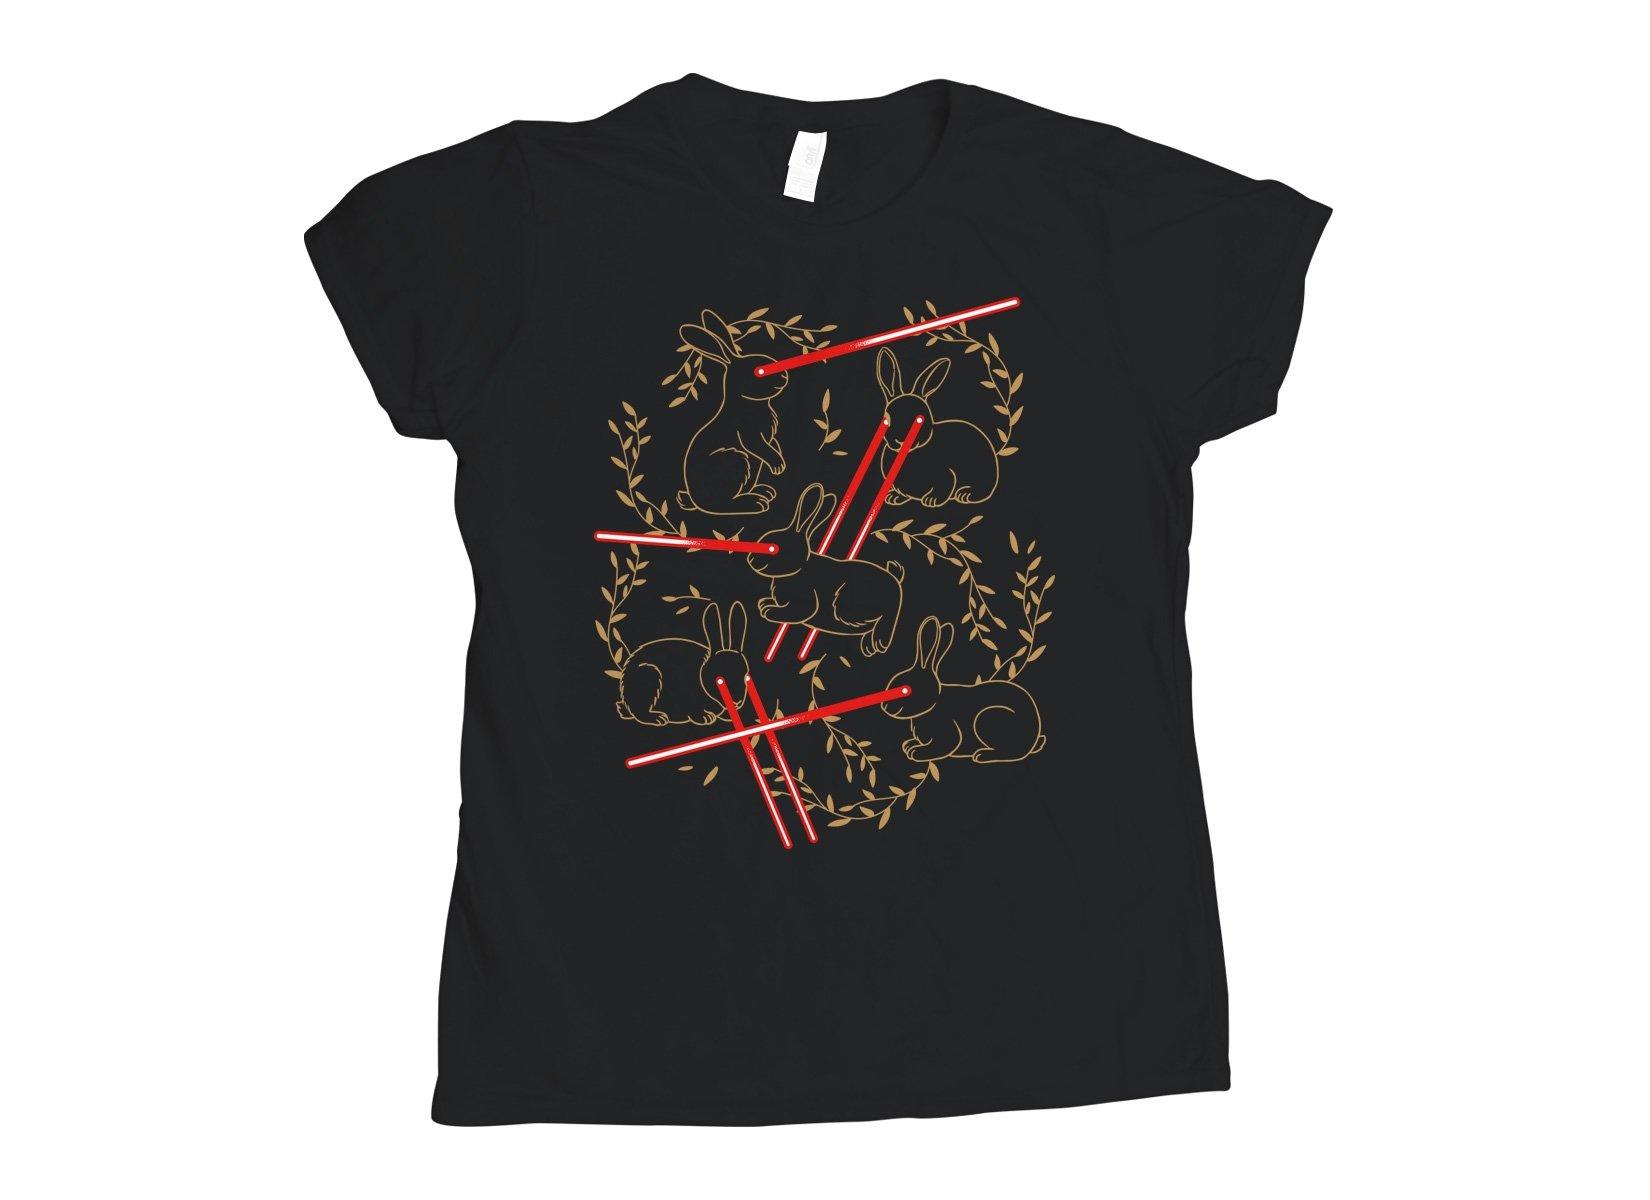 Laser Buns on Womens T-Shirt